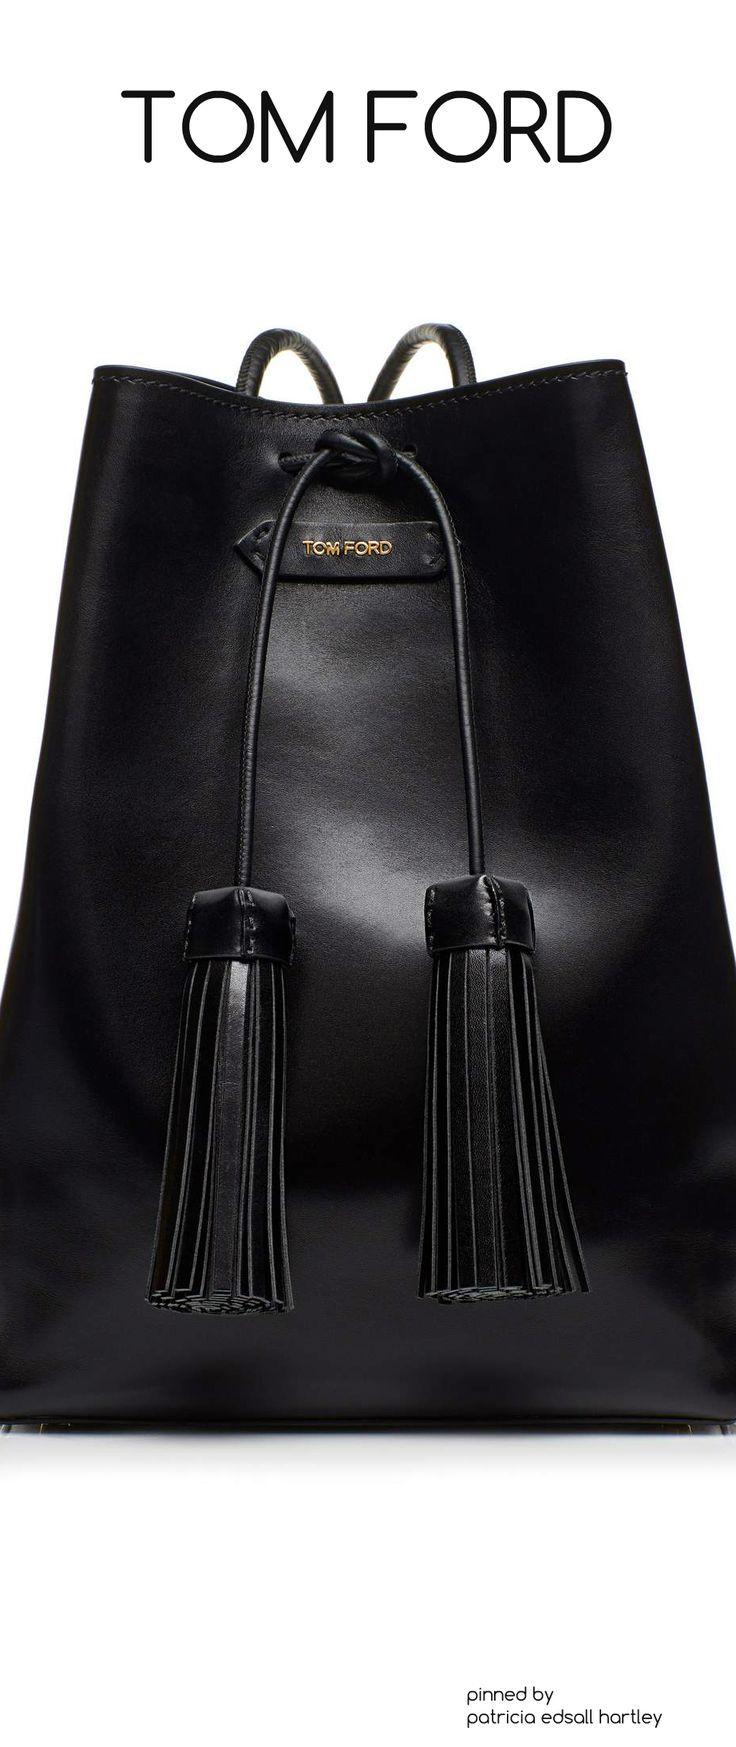 Black Tom Ford Tassel Bucket Bag. Gorgeous!   For More  handbags 2017 trends   Click Here http://moneybuds.com/Handbags/